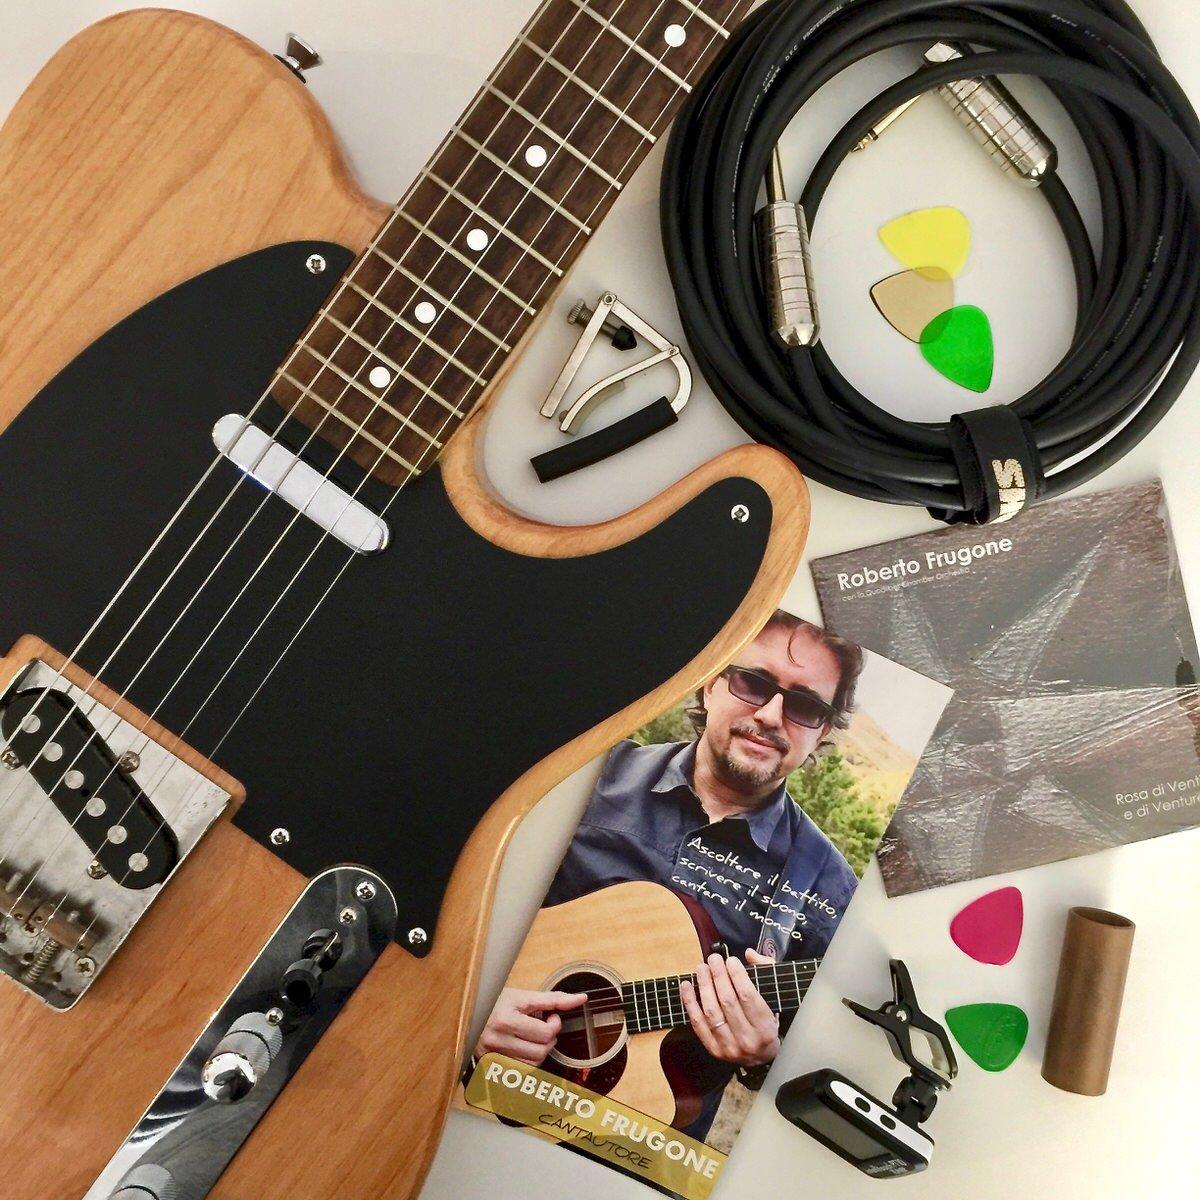 Roberto Frugone - Set chitarra elettrica